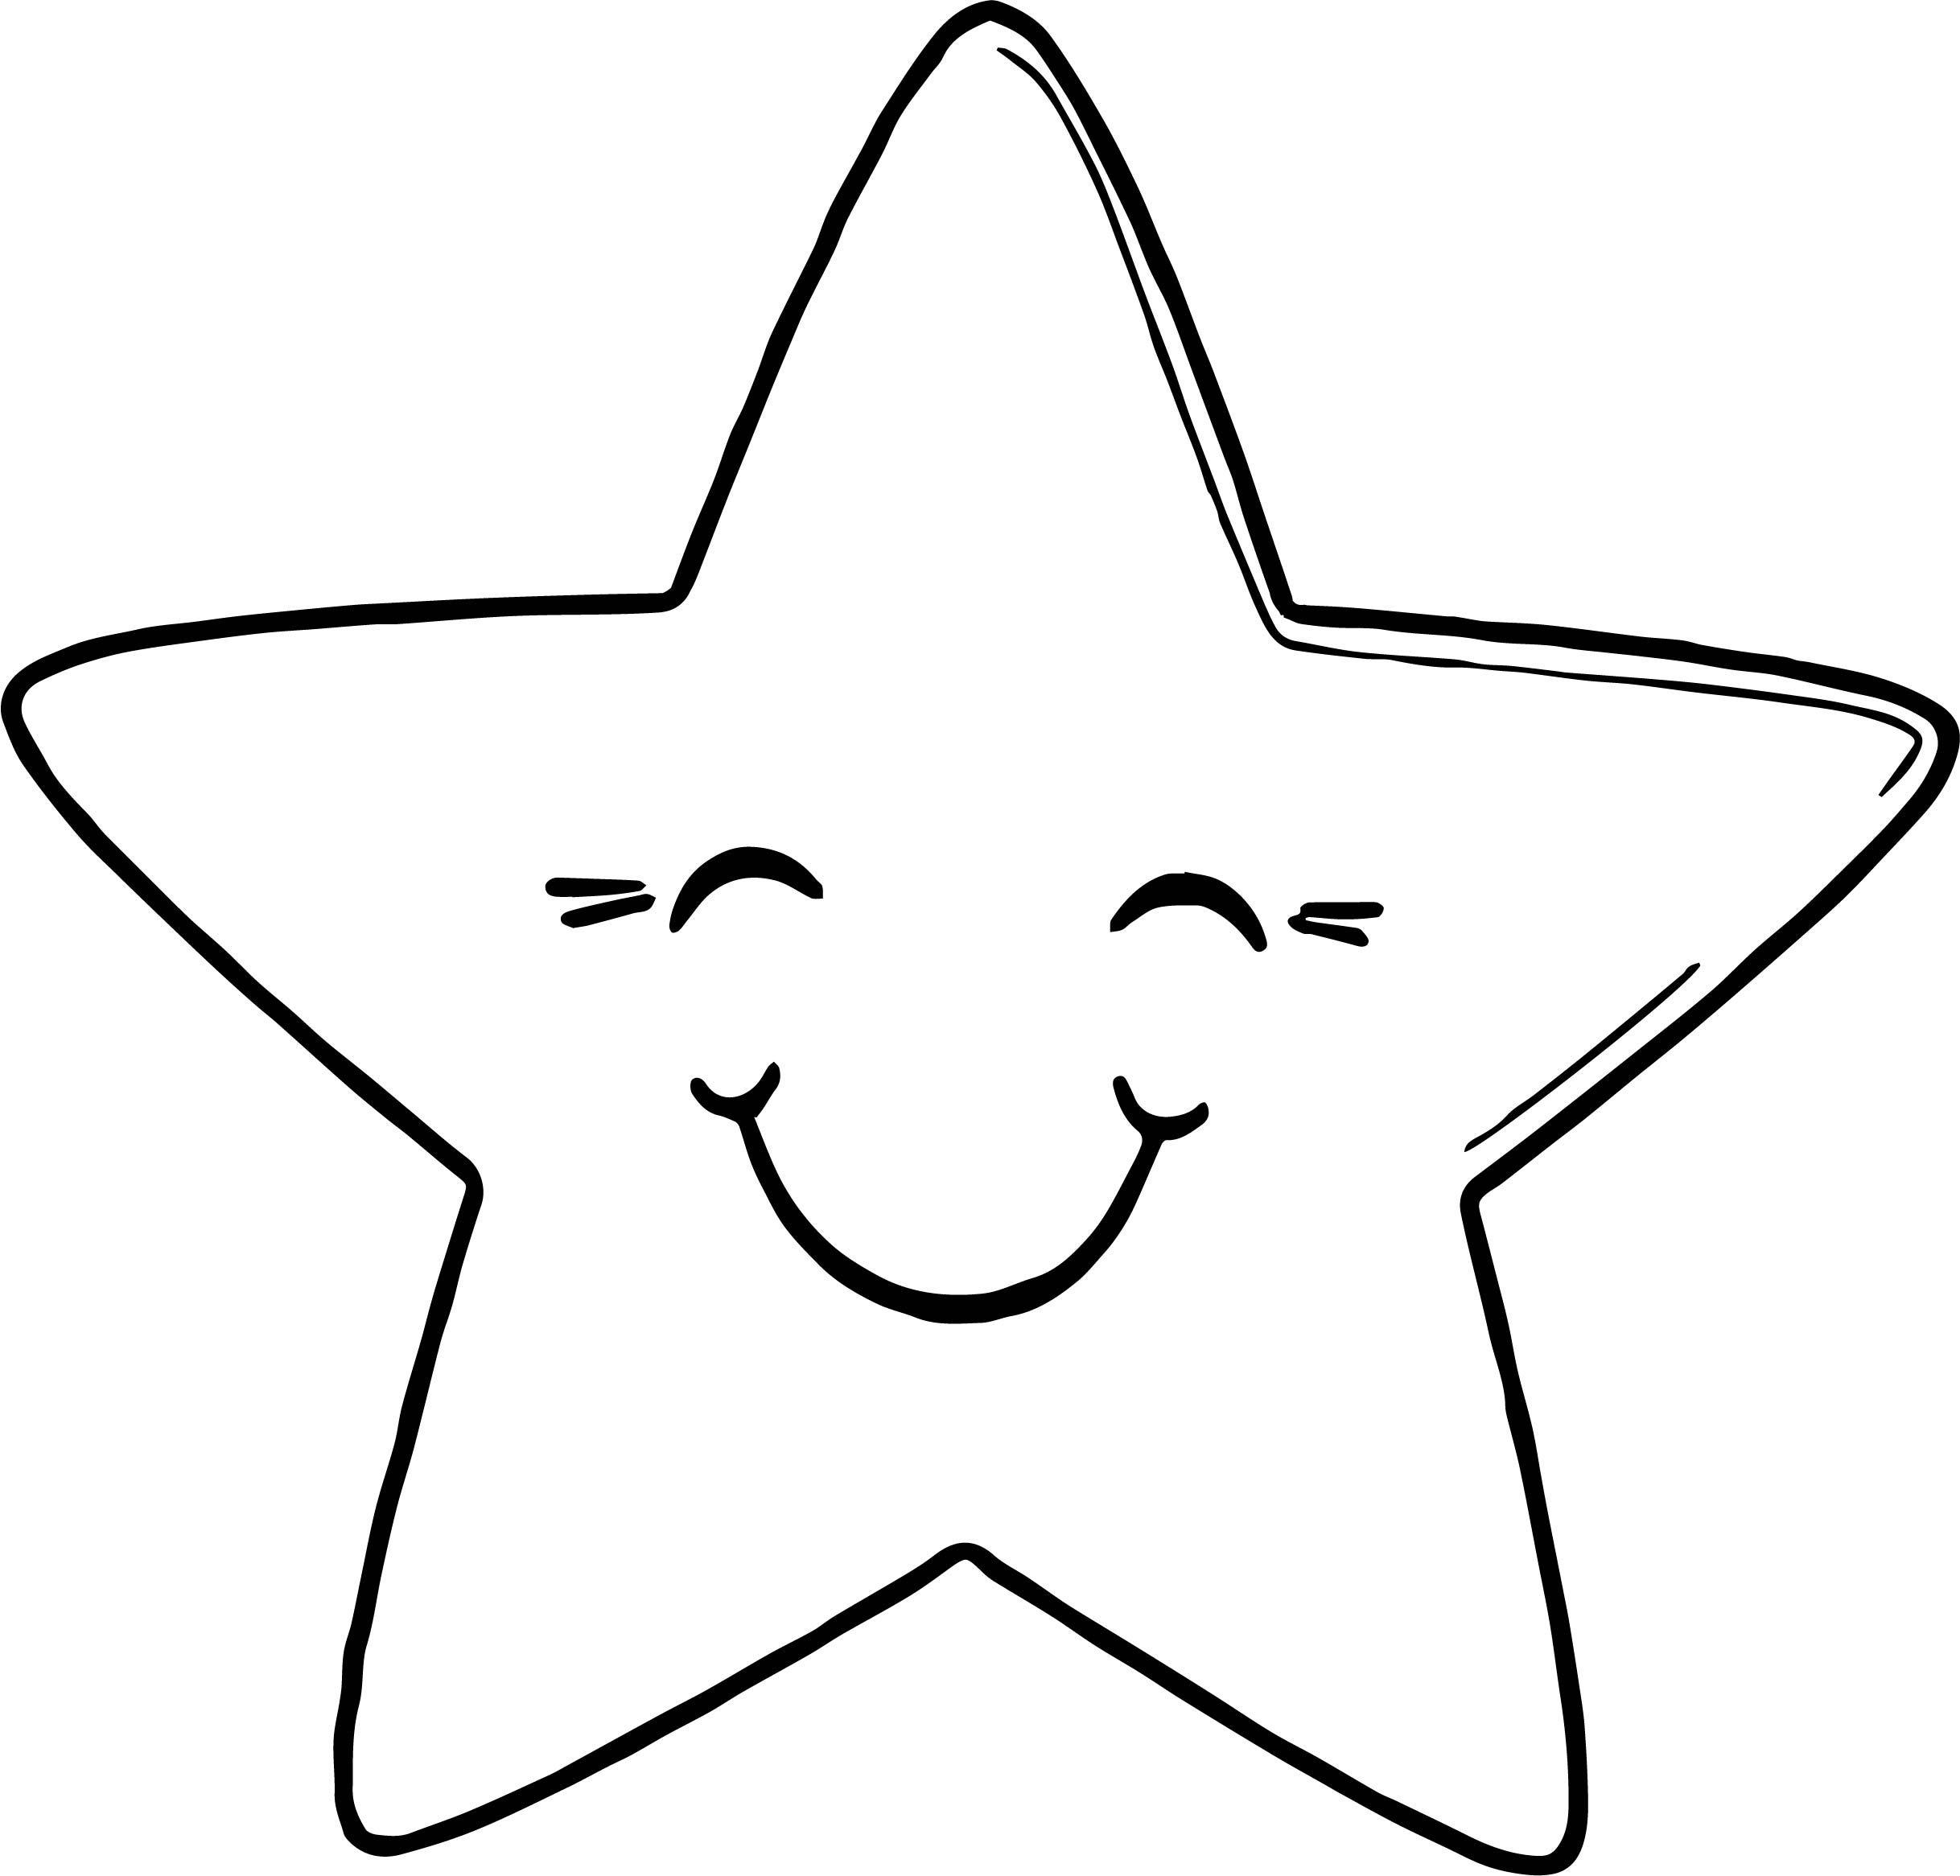 Nice Danny Phantom Star Coloring Page Star Coloring Pages Coloring Pages Space Coloring Pages